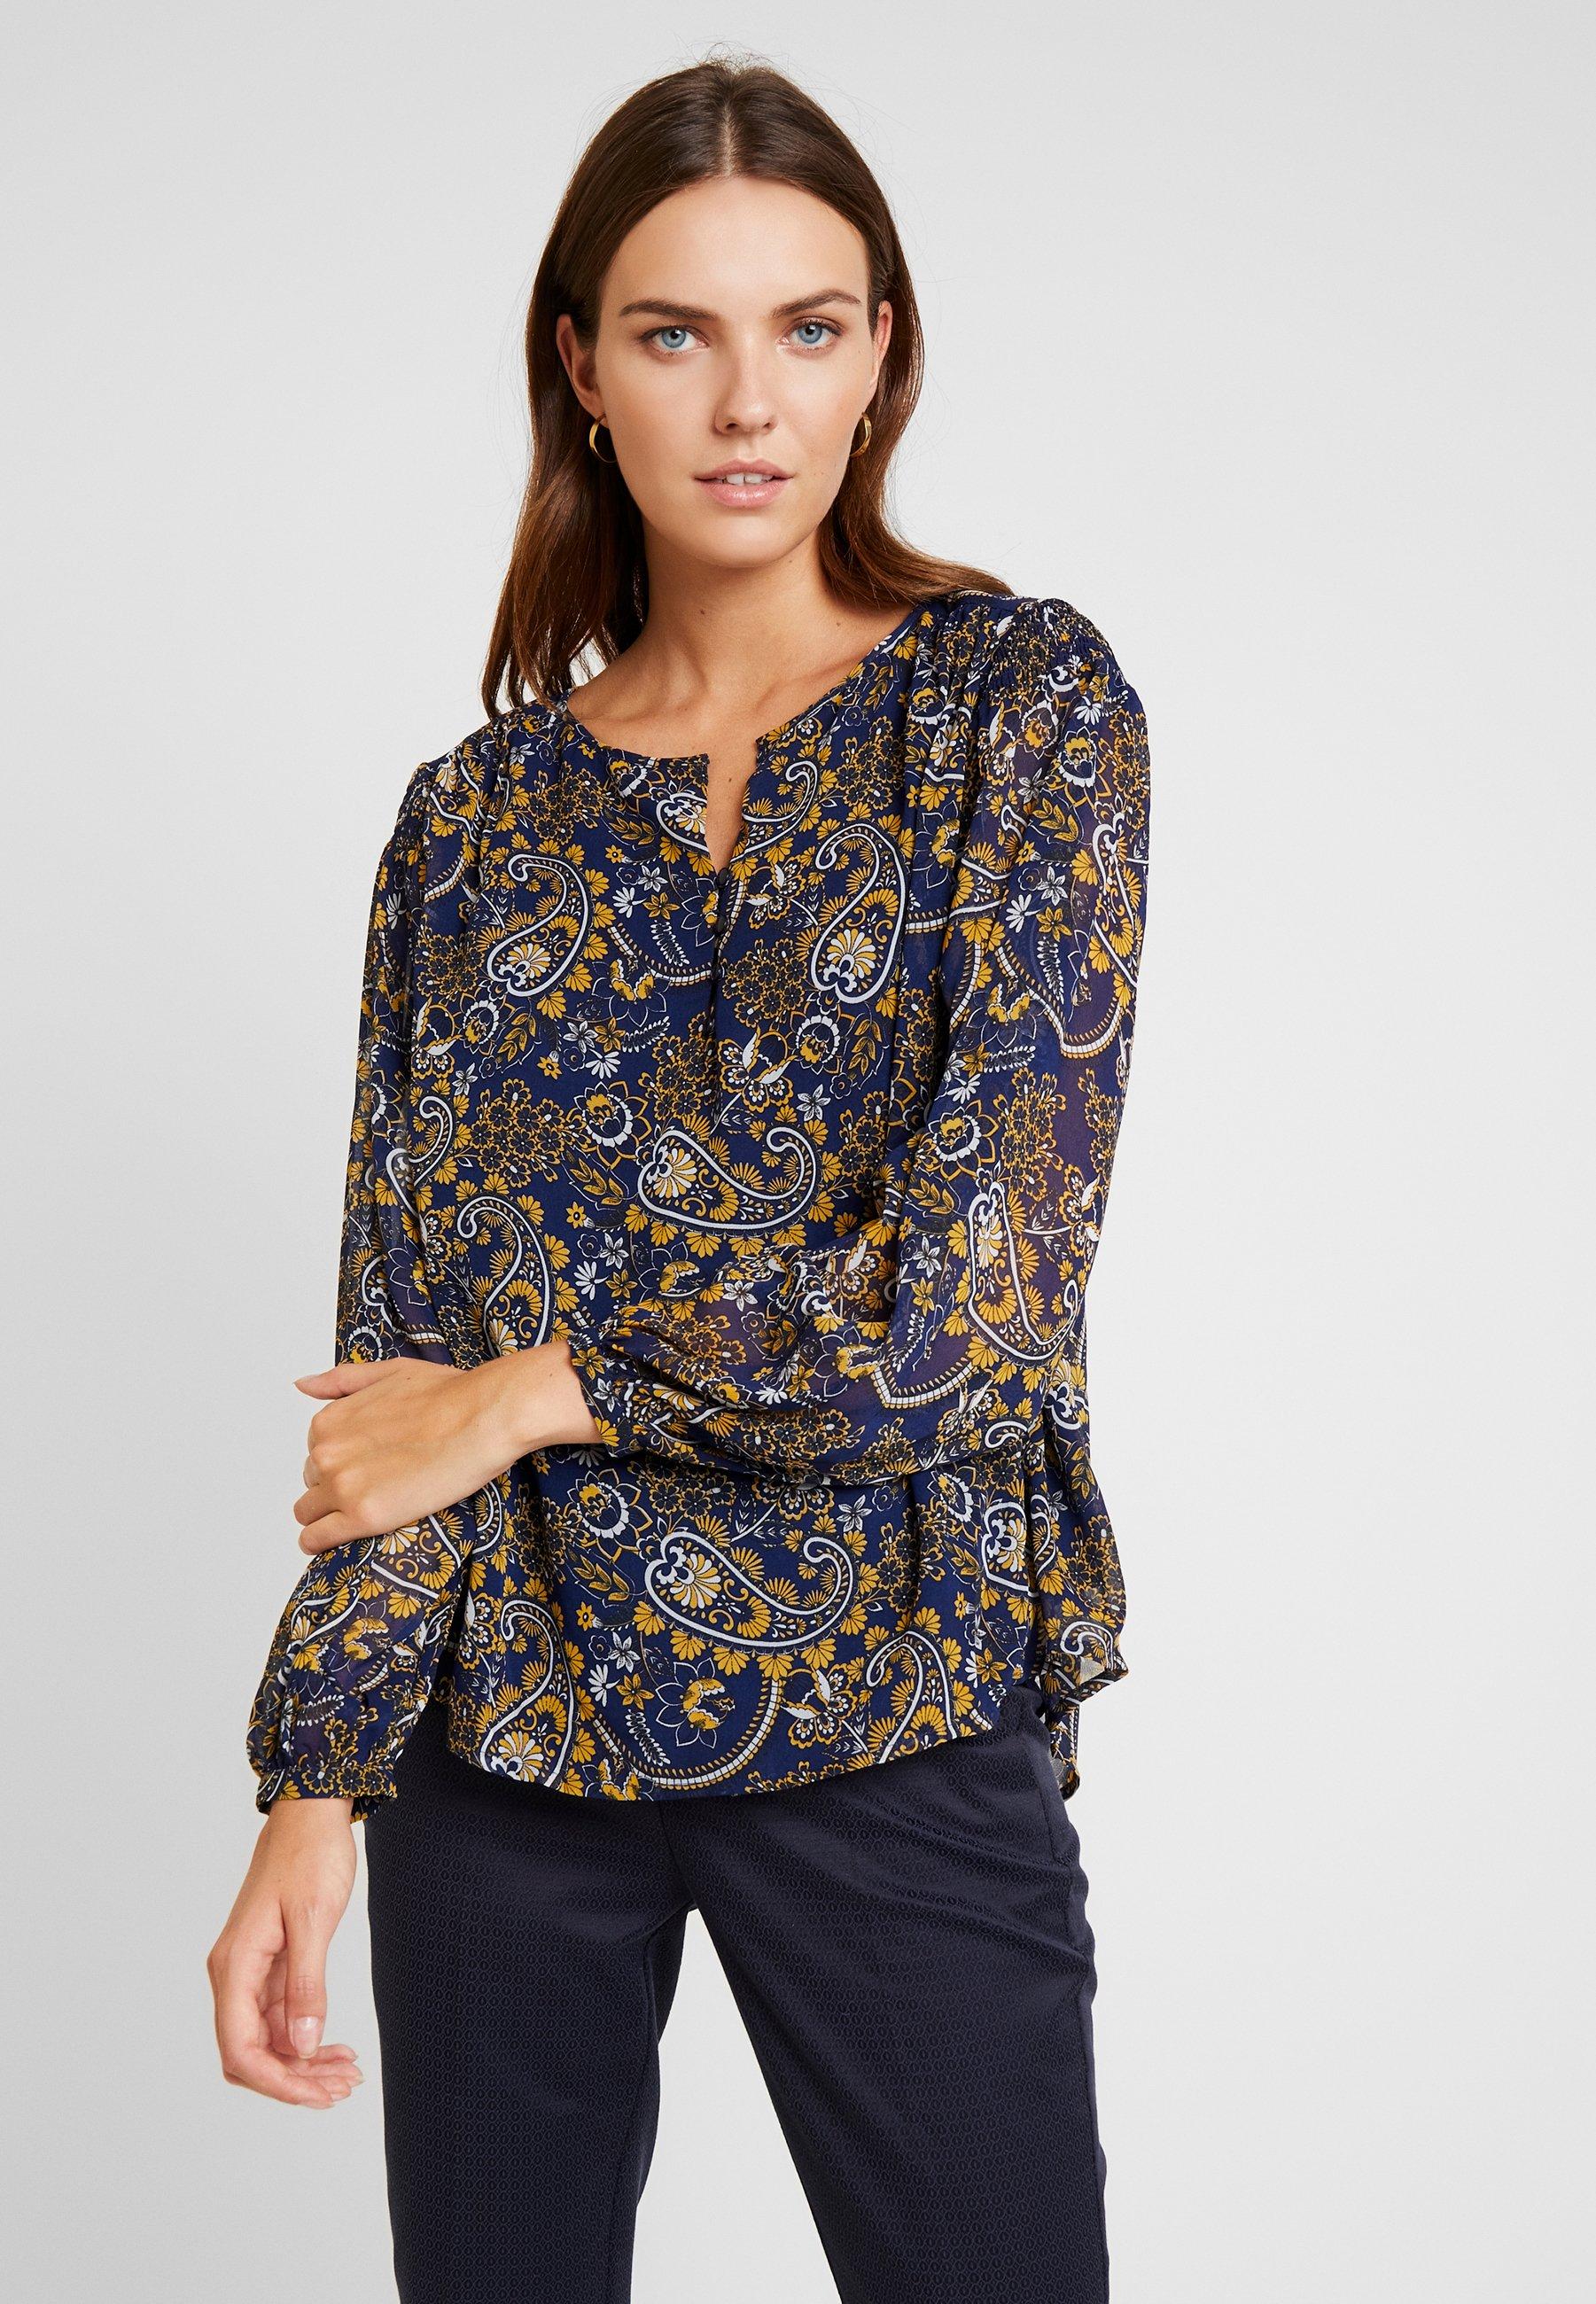 Fransa Skjorte Masjacket 1 Black mix | Rutete skjorter